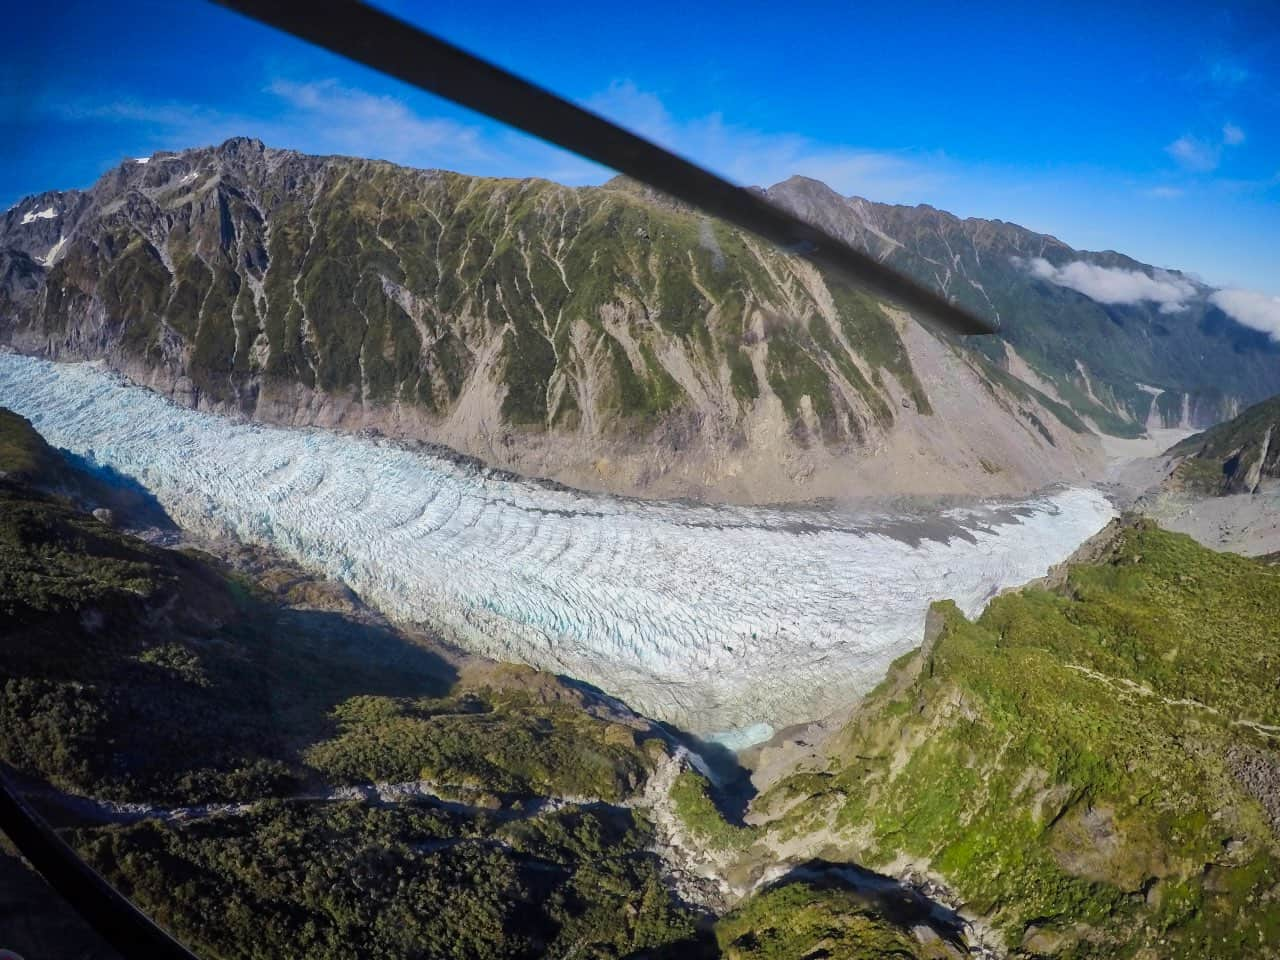 Helicopter-senicflight-Fox-Glacier-New-Zealand